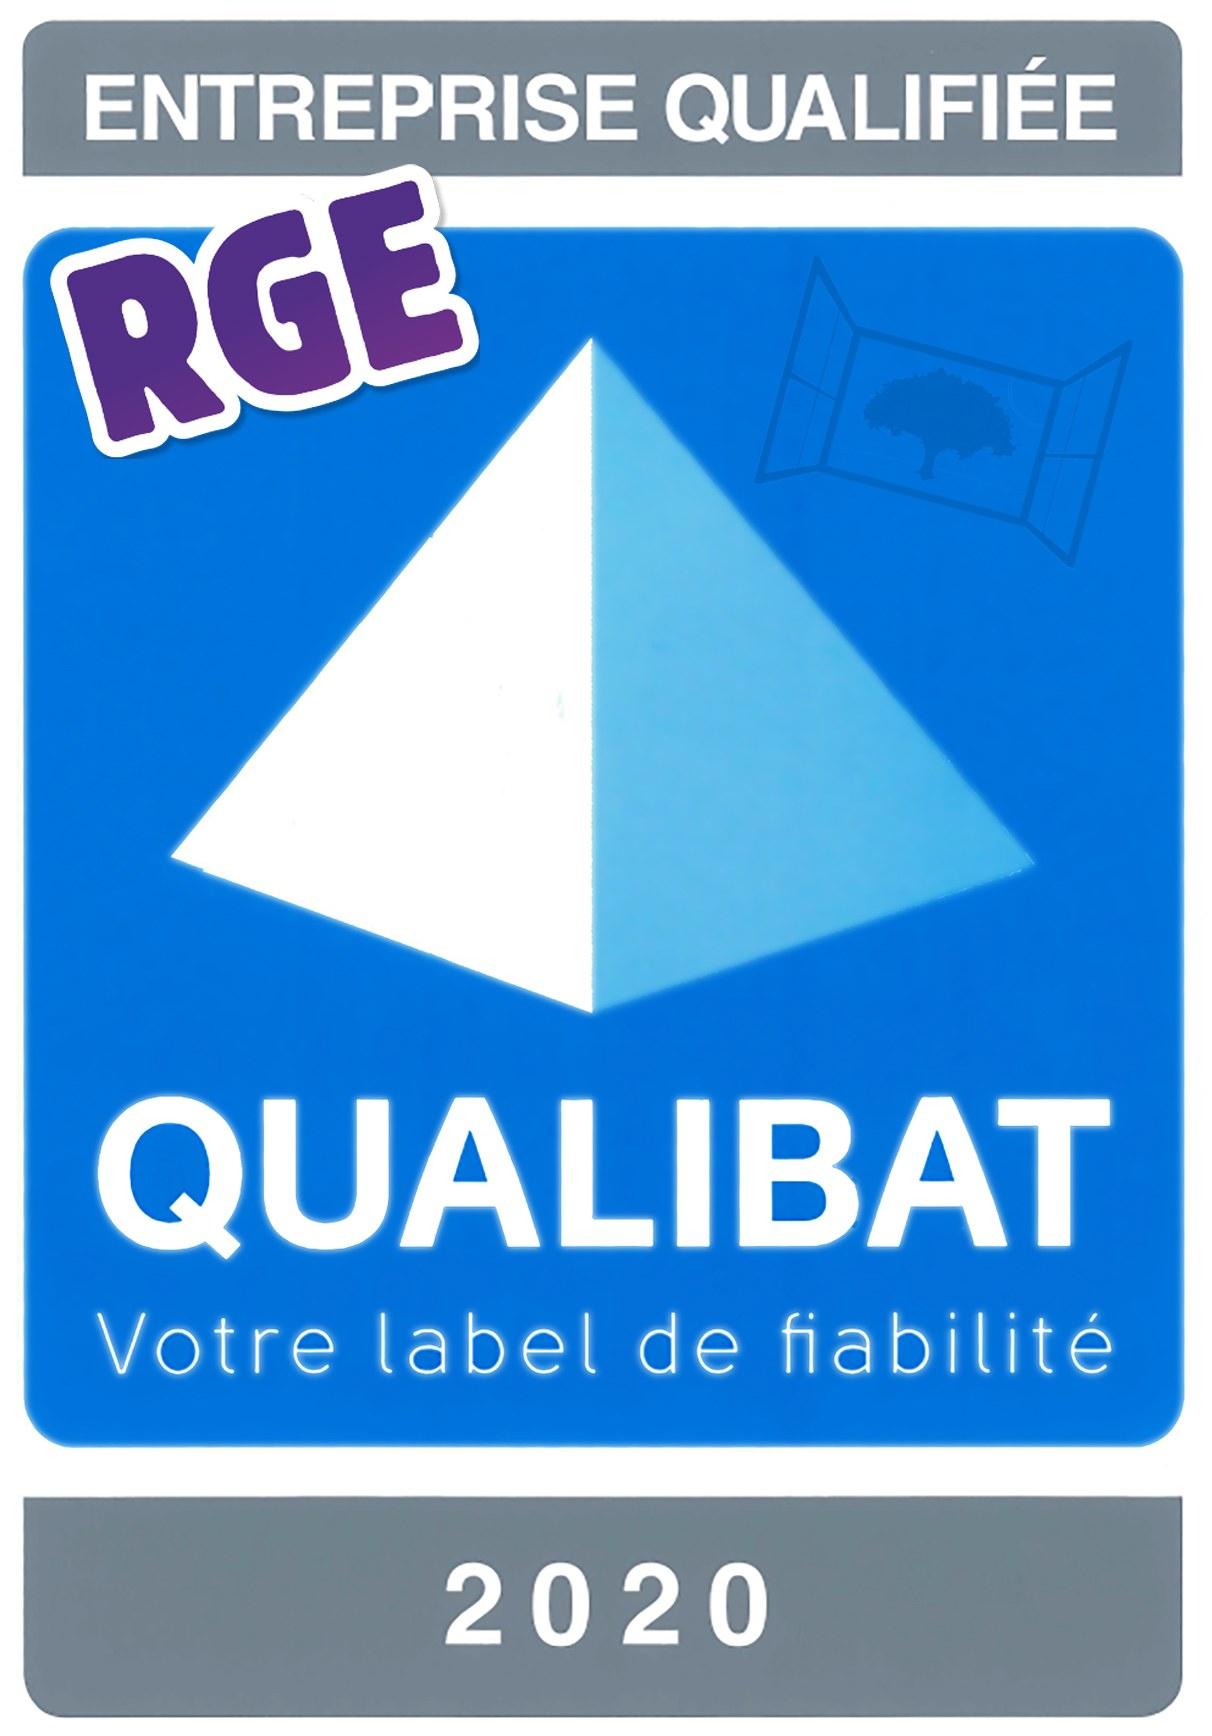 Logo RGE 2020 qualibat